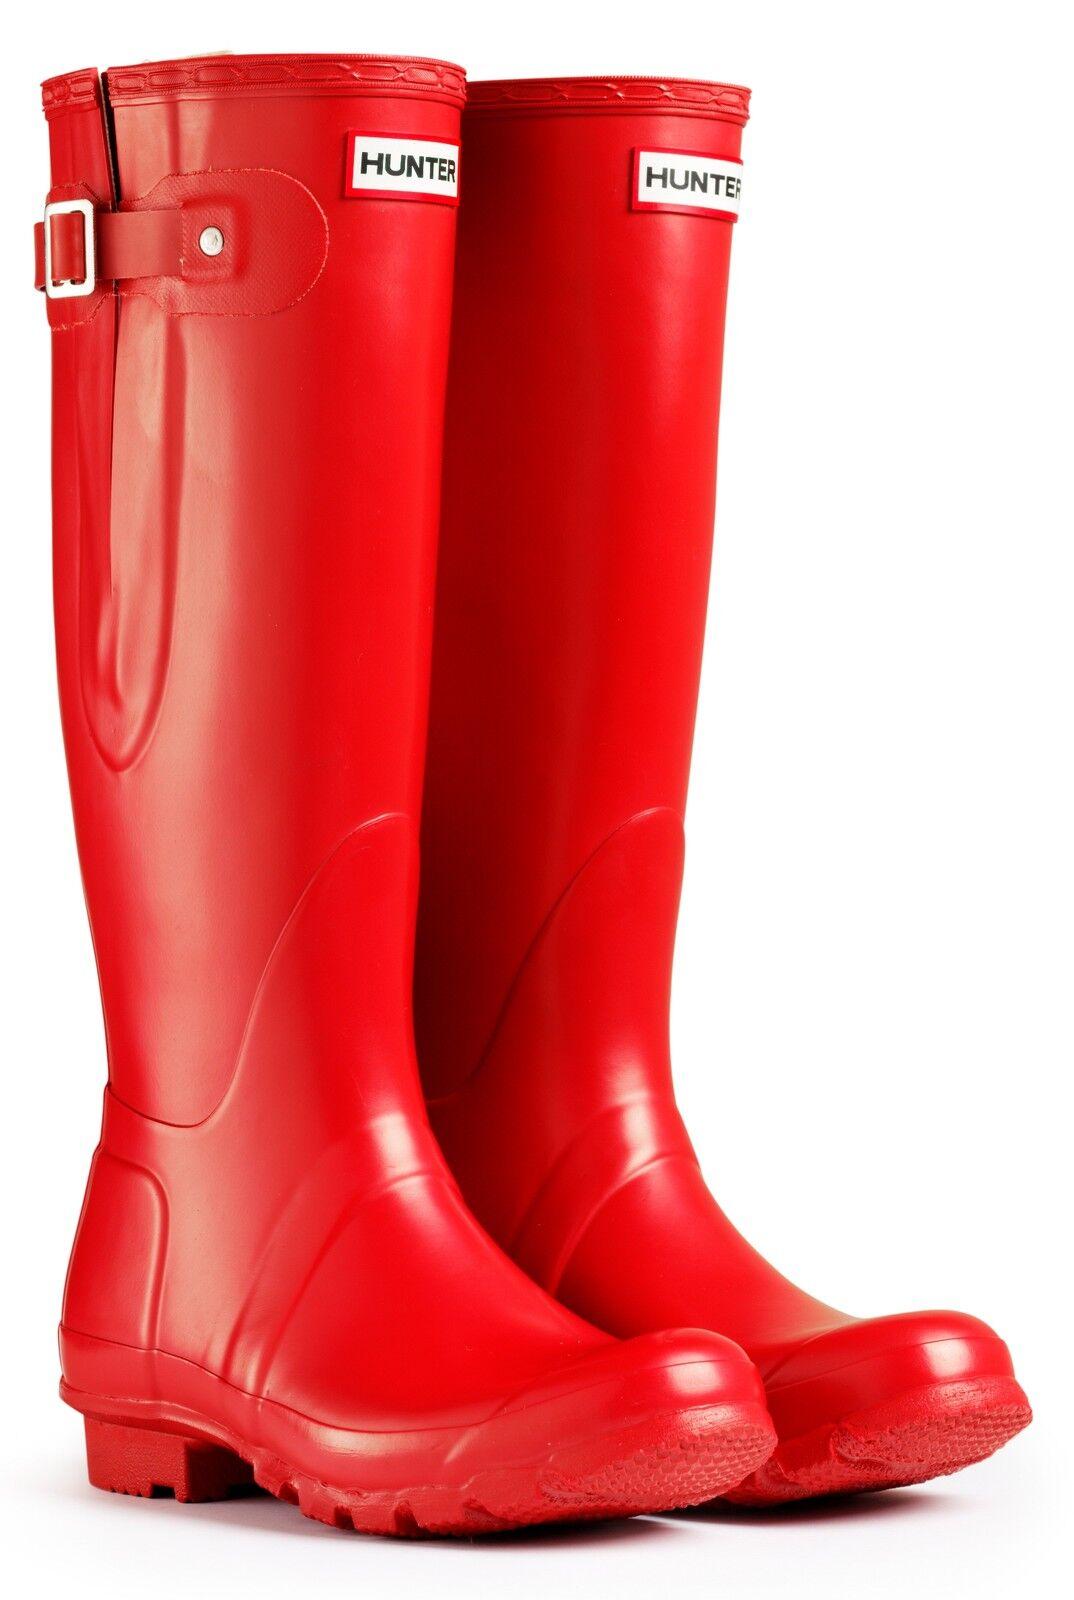 Hunter Wellington Stiefel Wellies Welly Original Adjustable ROT Größe UK 3 Eu 35/36